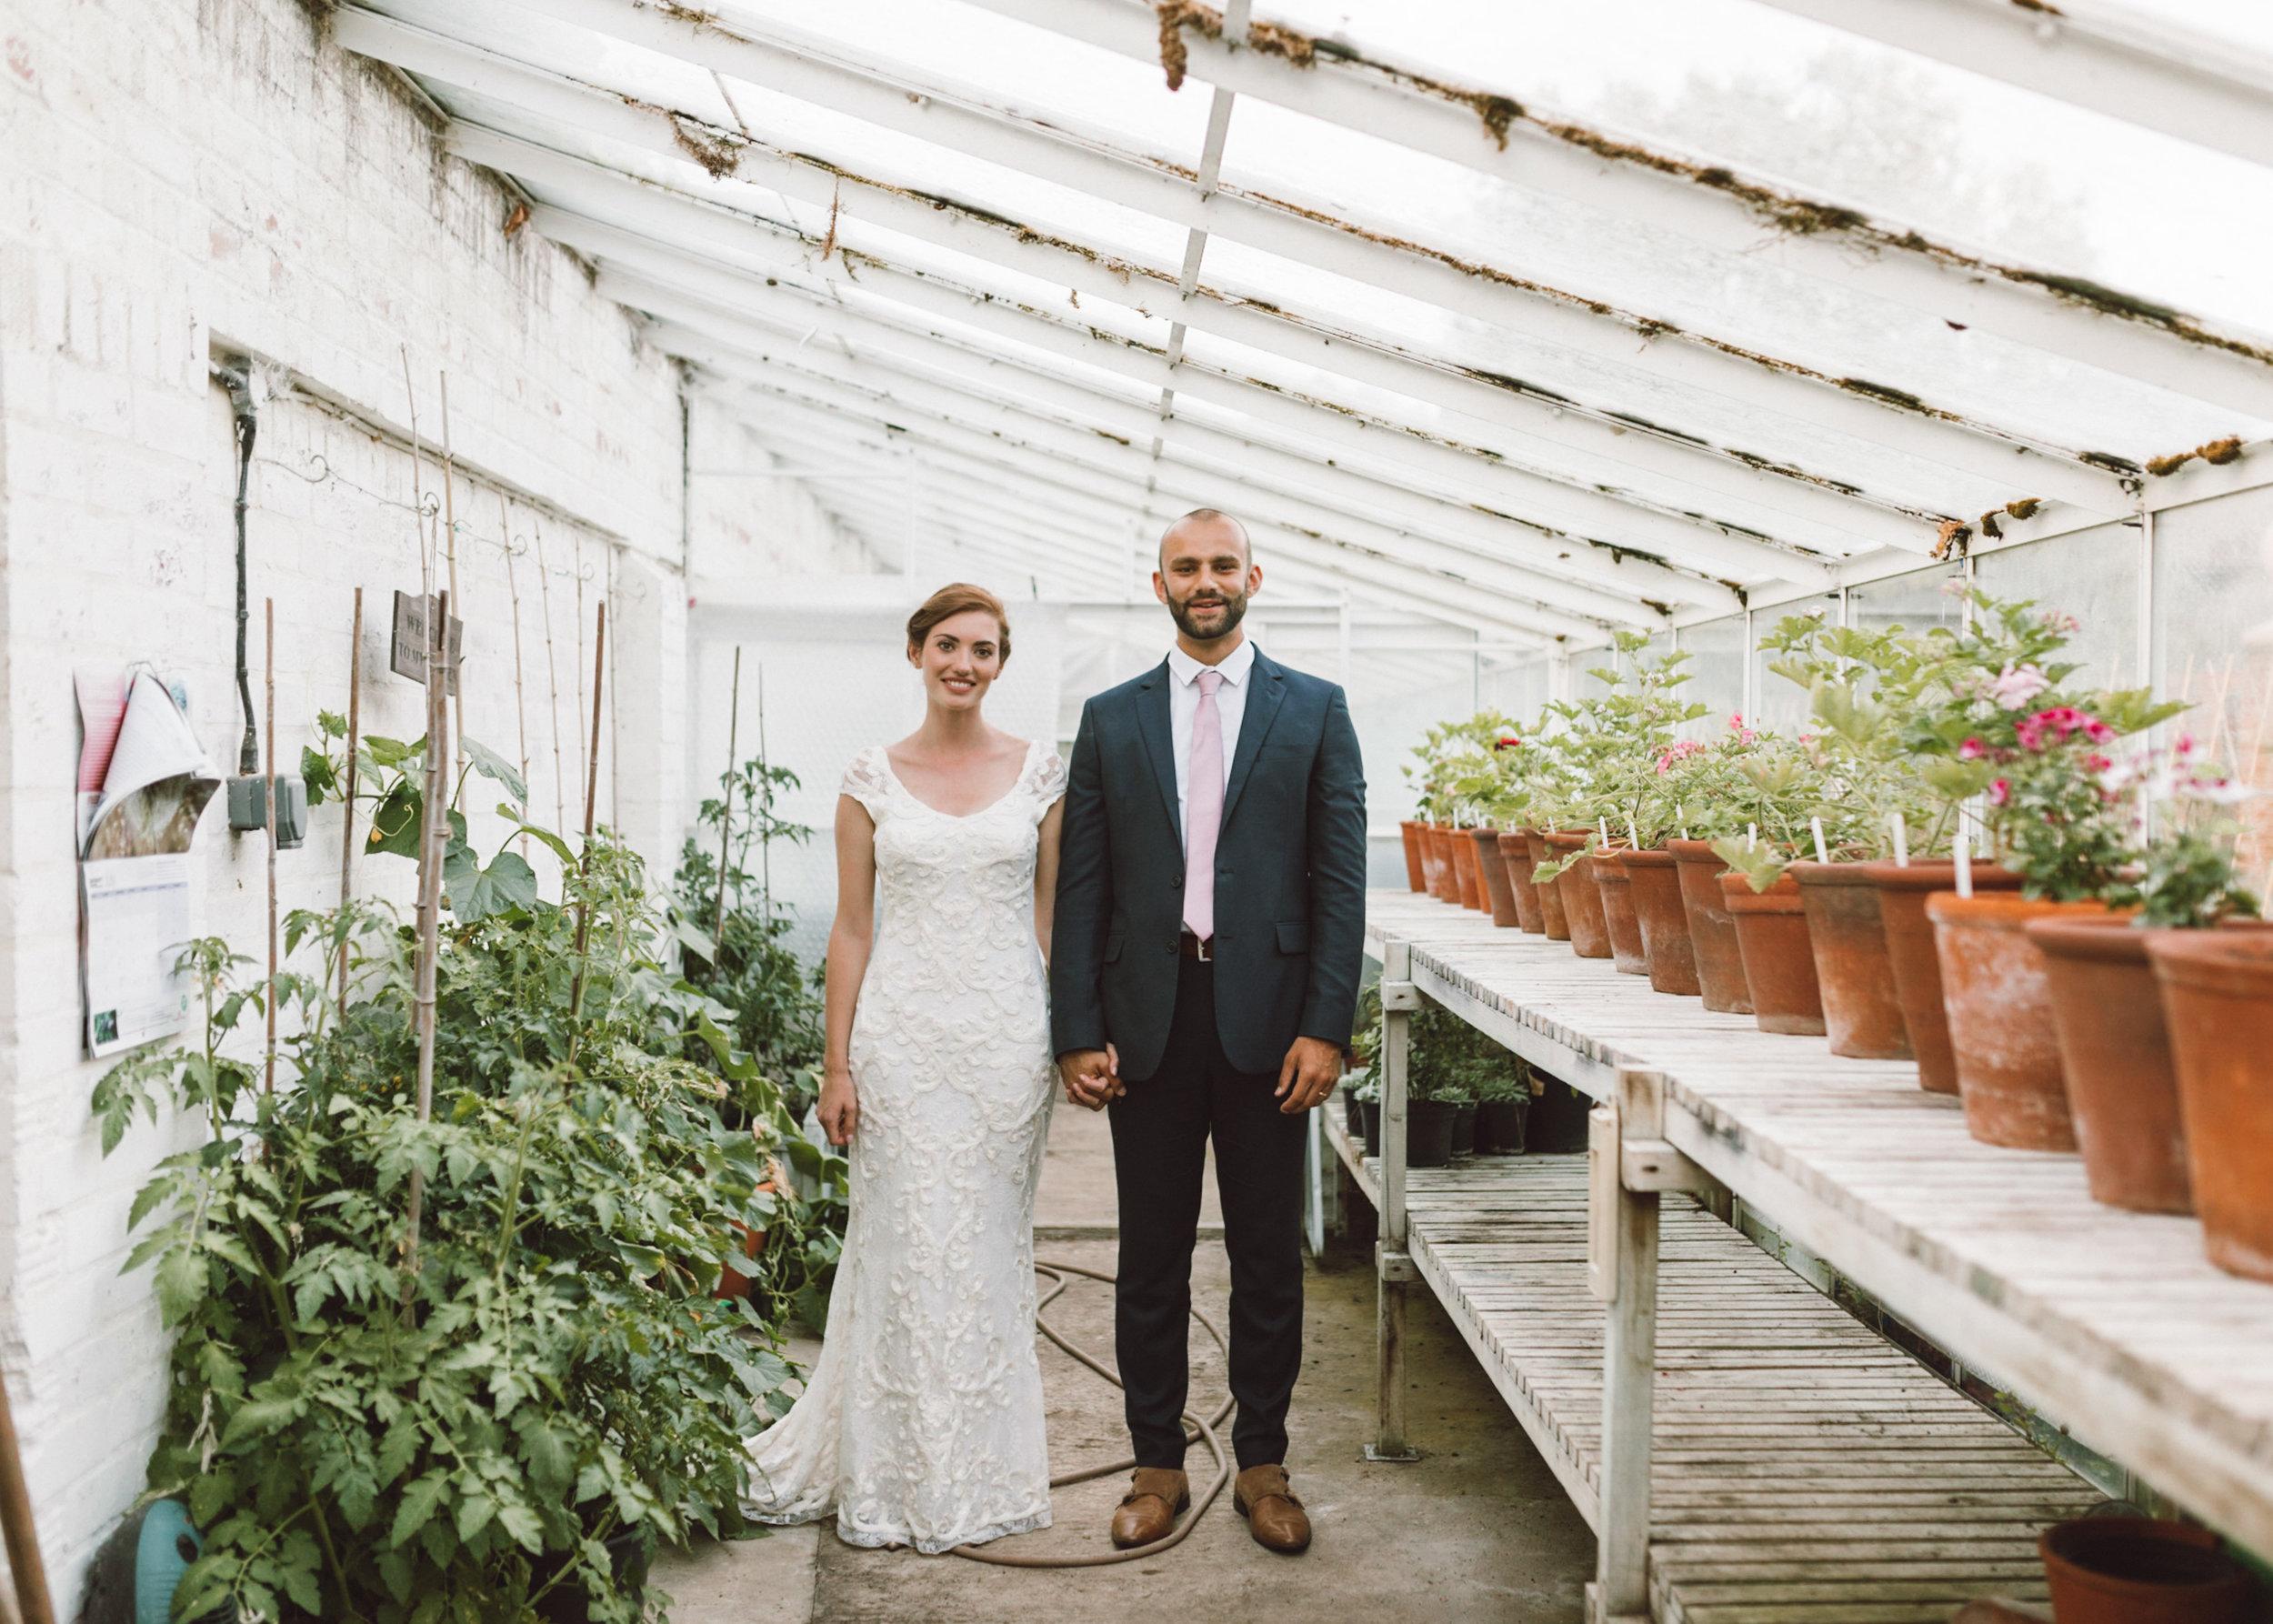 Emily & Steve Photography Summer-Garden-Wedding-222.jpg